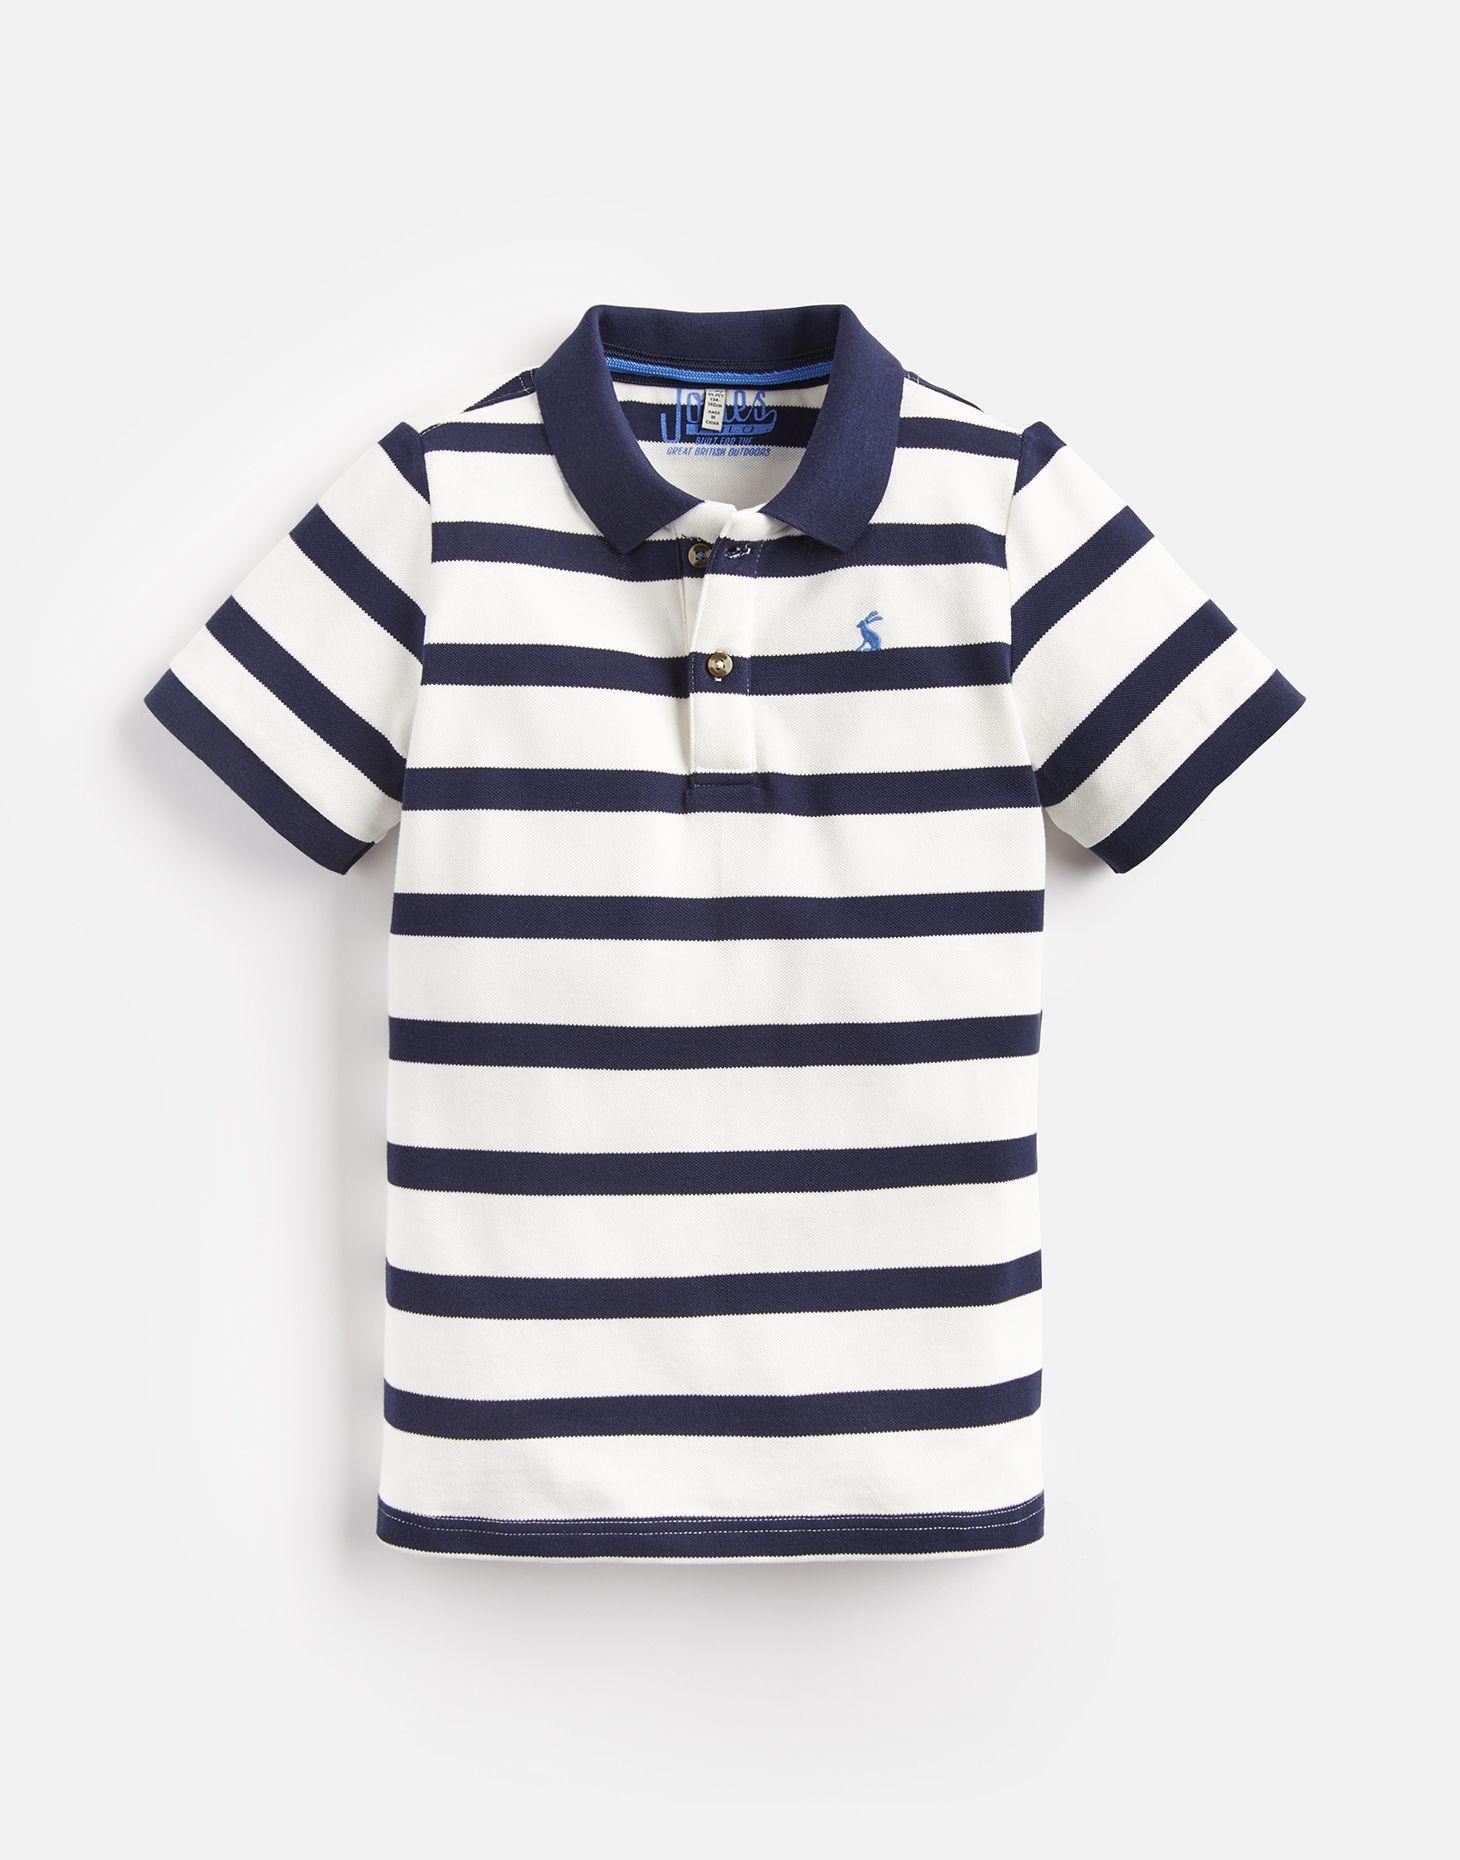 1f52daa7c Filbert CREAM NAVY STRIPE Boys Stripe Polo Shirt 3-12 Yr | Joules UK